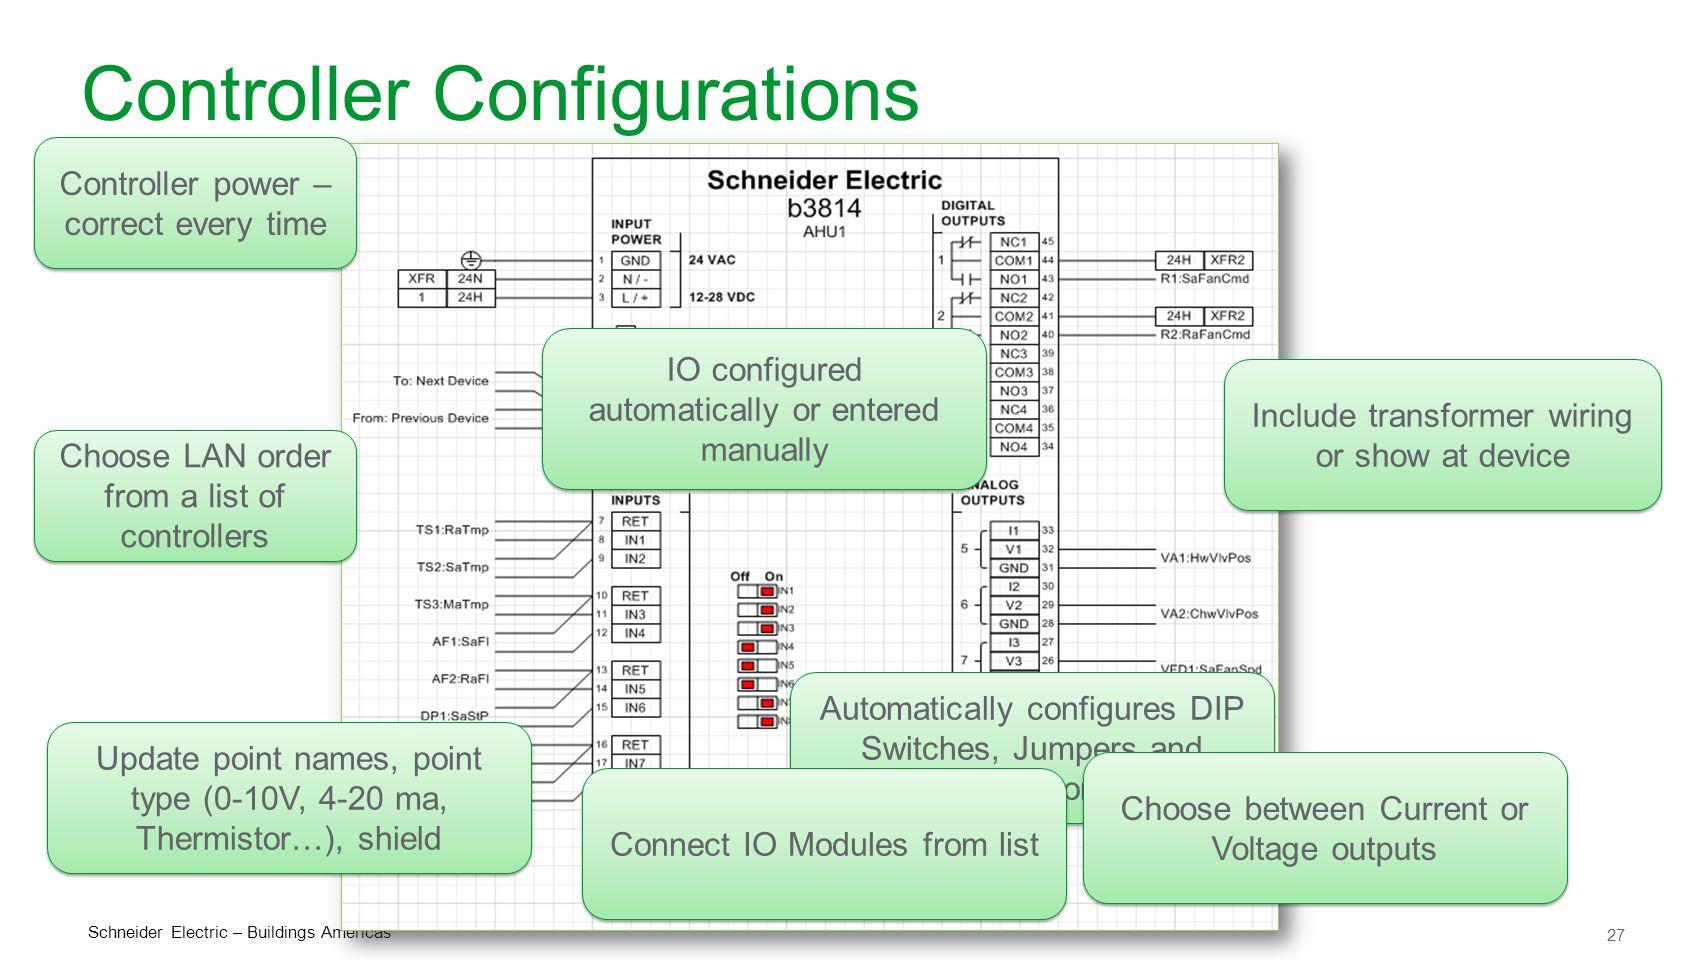 Controller Configurations